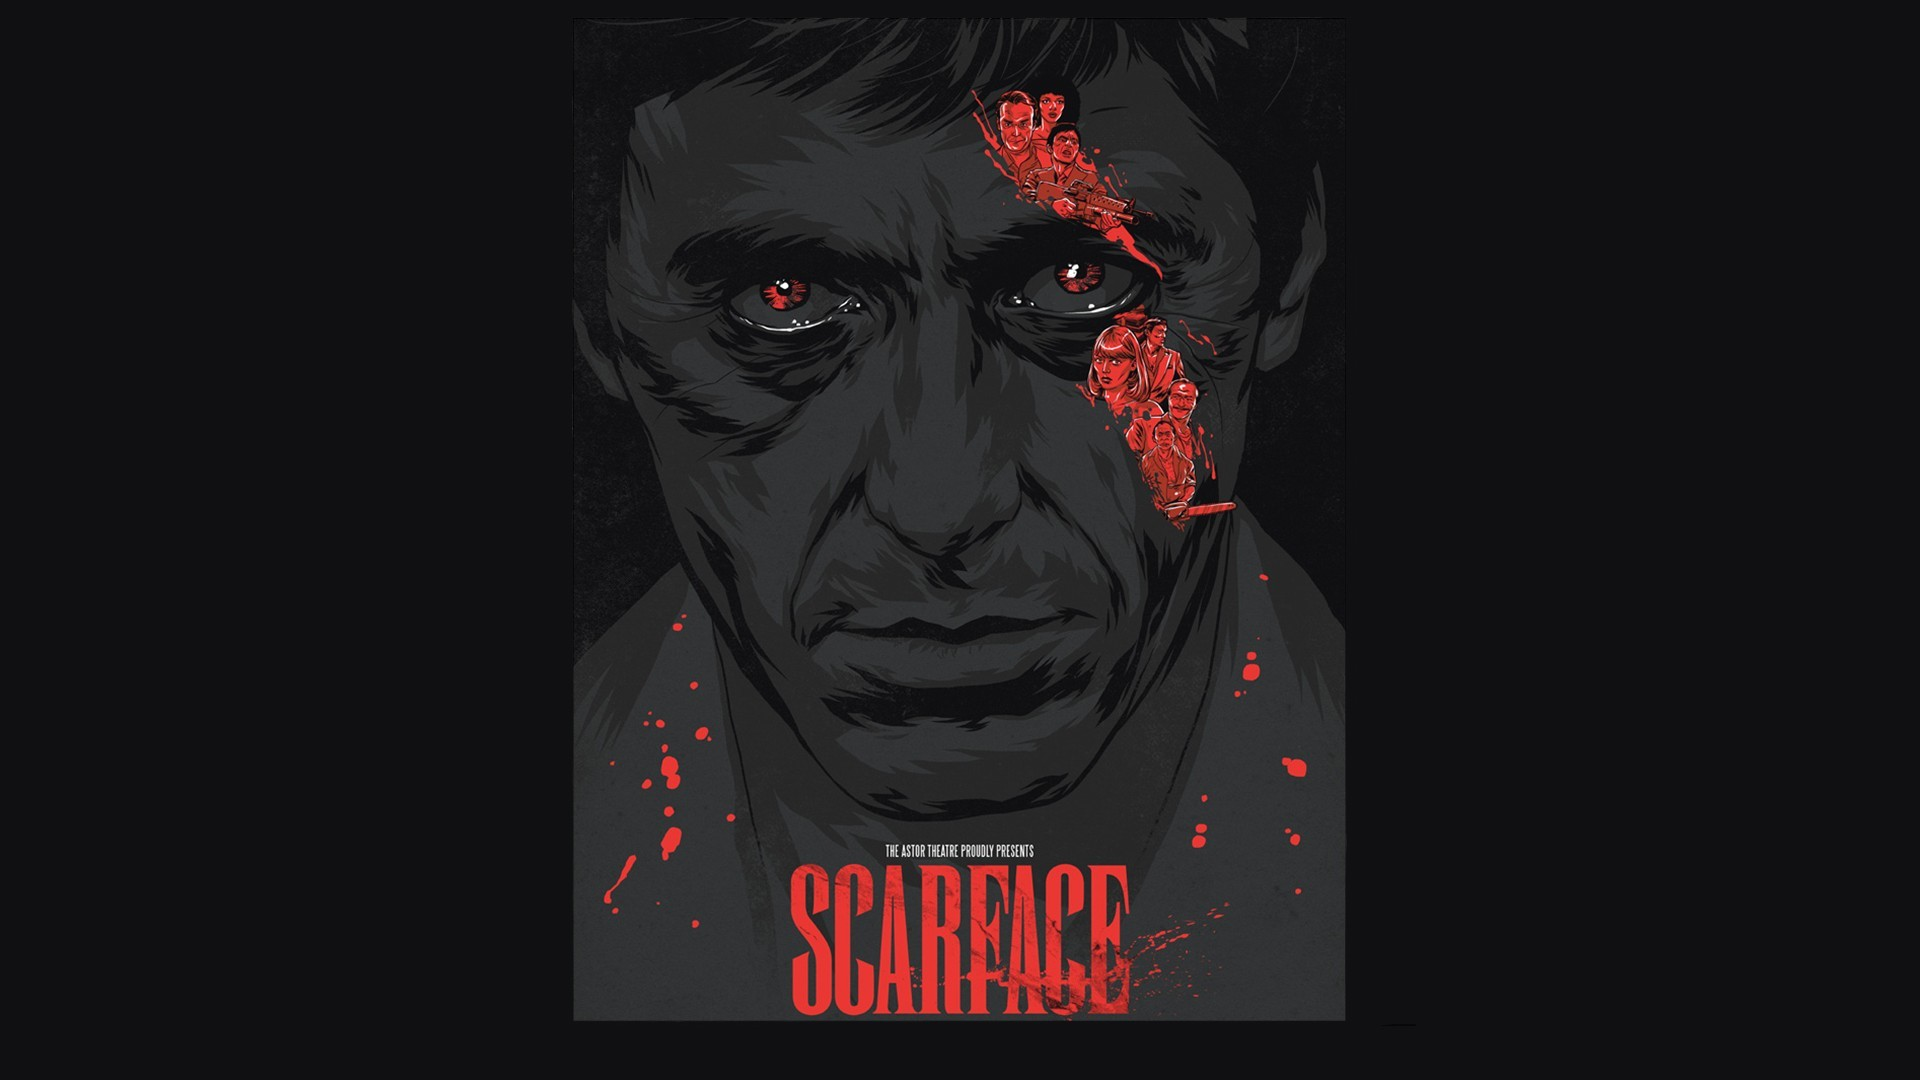 Scarface Wallpaper Hd Wallpapertag